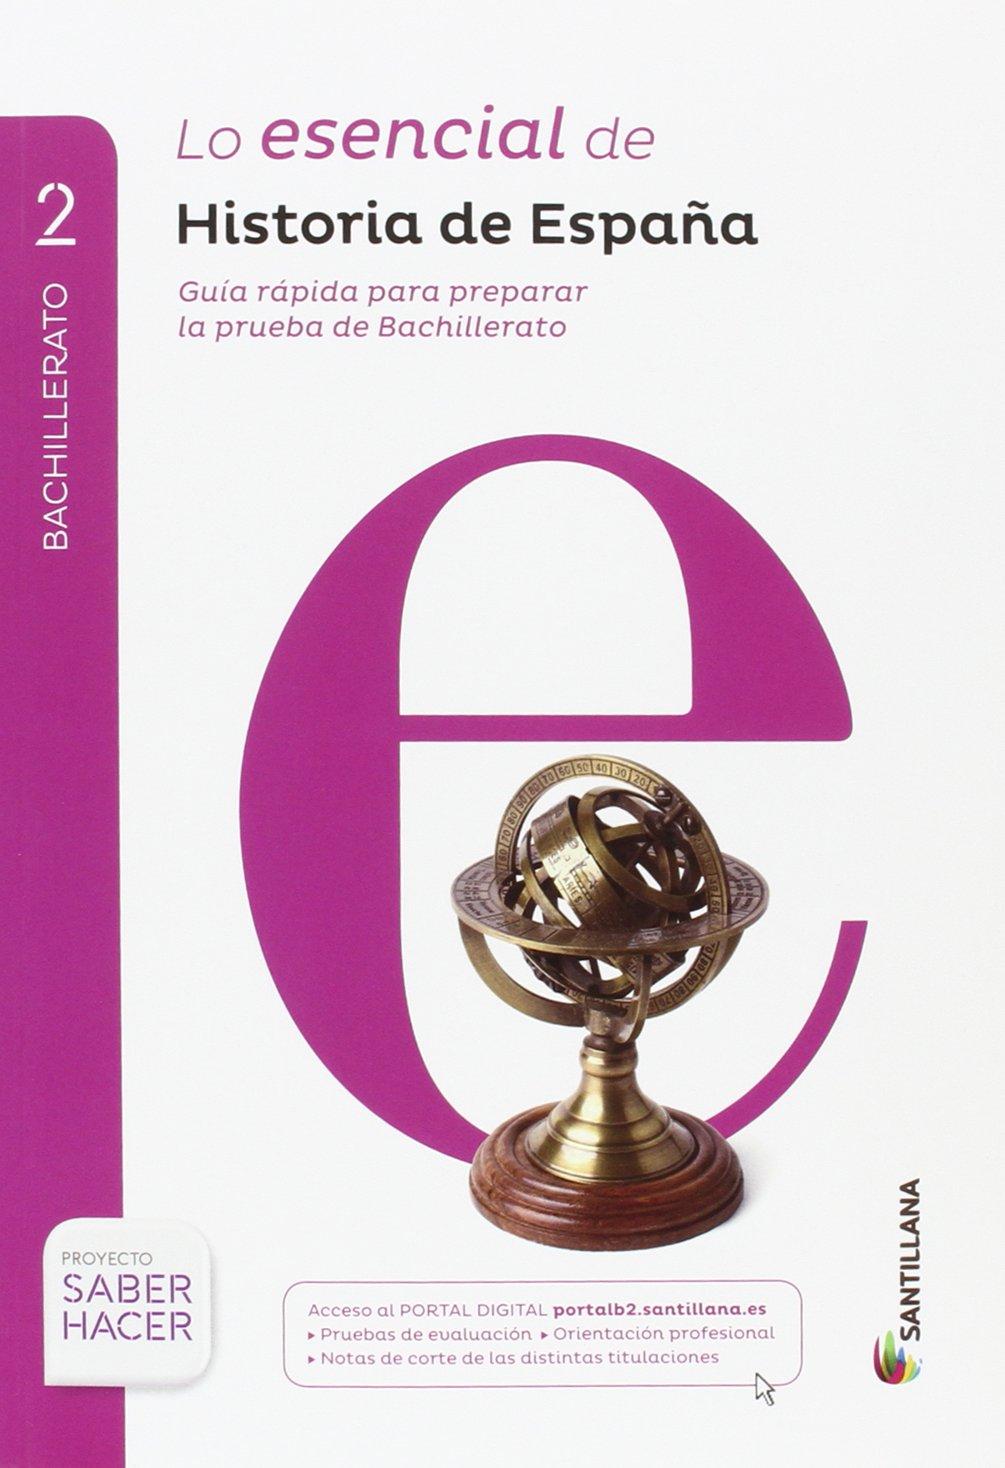 HISTORIA DE ESPAÑA ARAGÓN SERIE DESCUBRE 2 BTO SABER HACER - 9788414101858: Amazon.es: Aa.Vv.: Libros